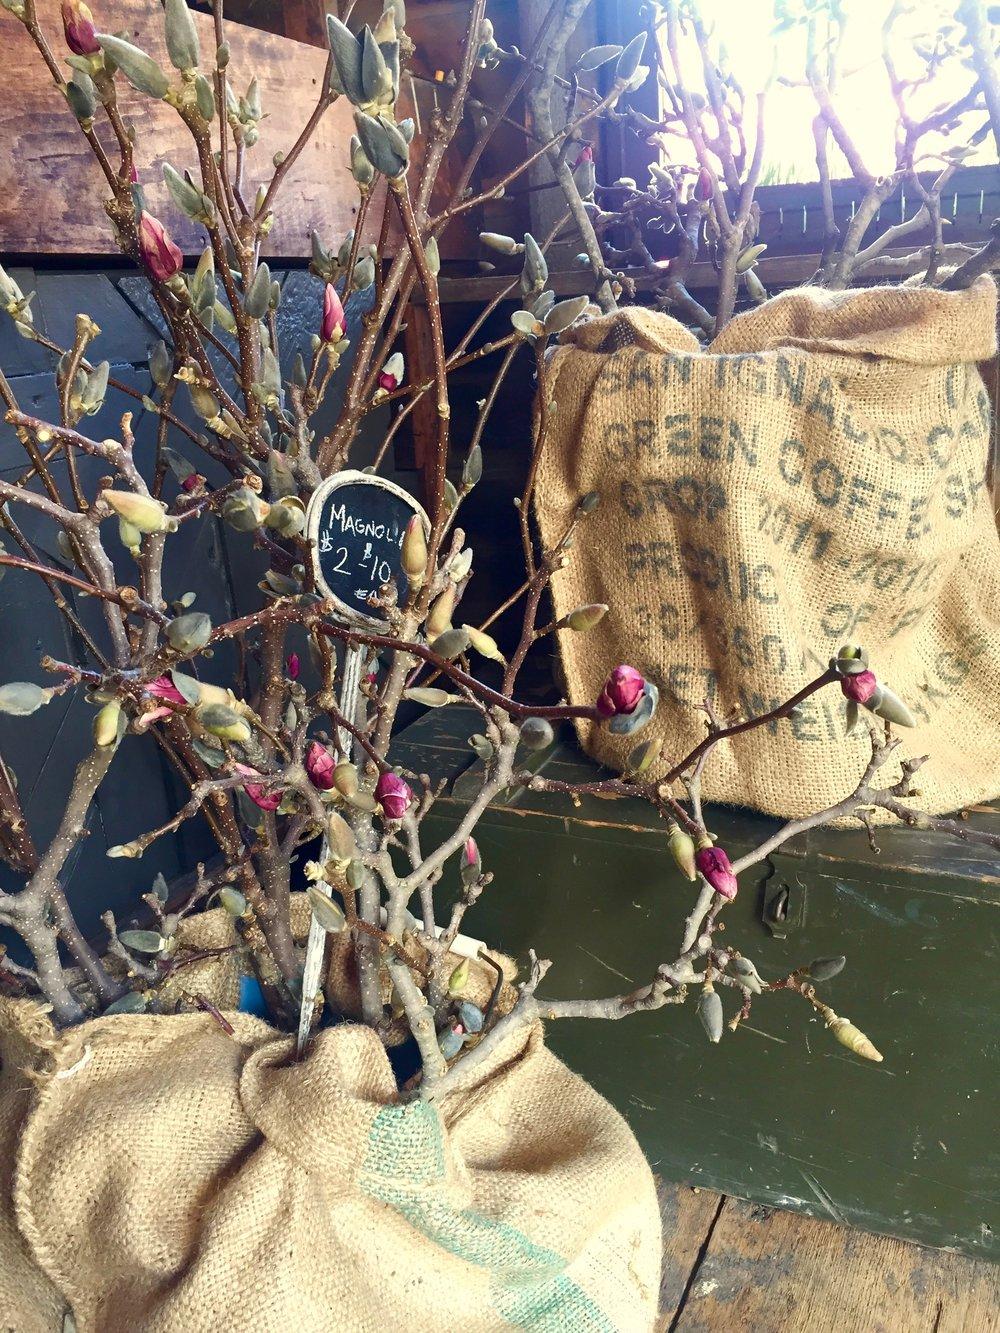 magnolia burlap hort and pott